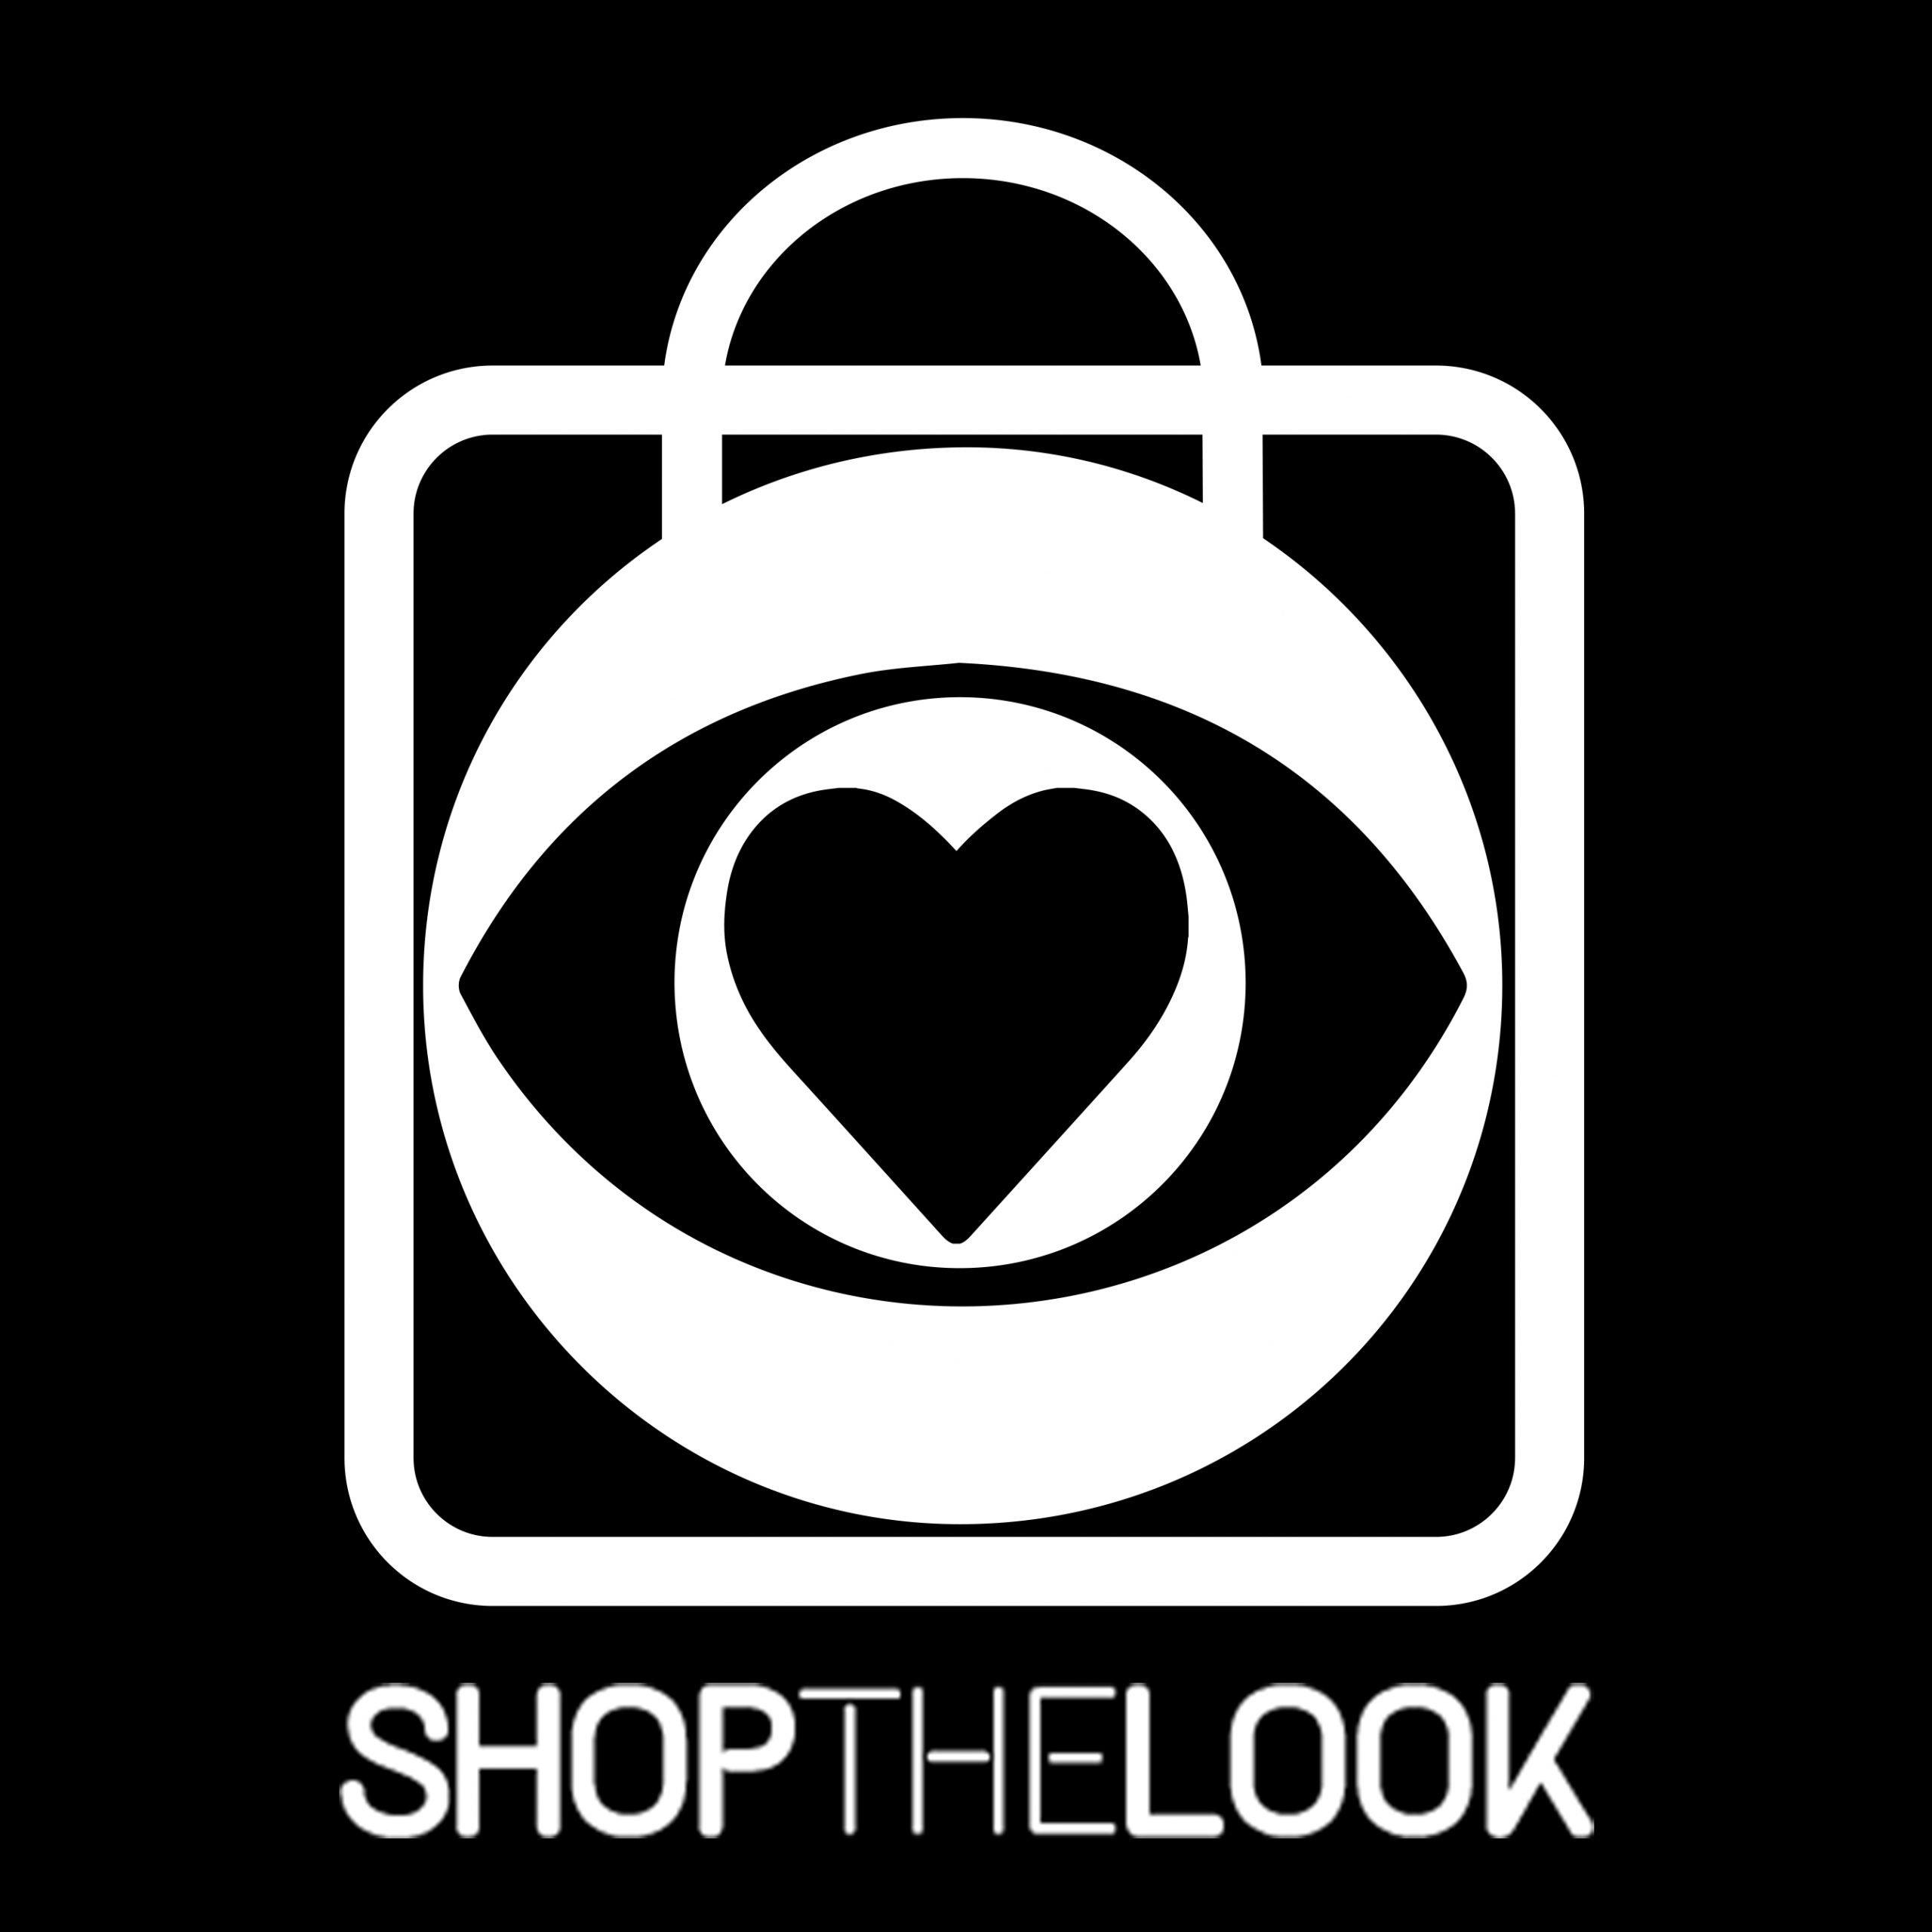 Logo-Shopthelook-3-scaled.jpg